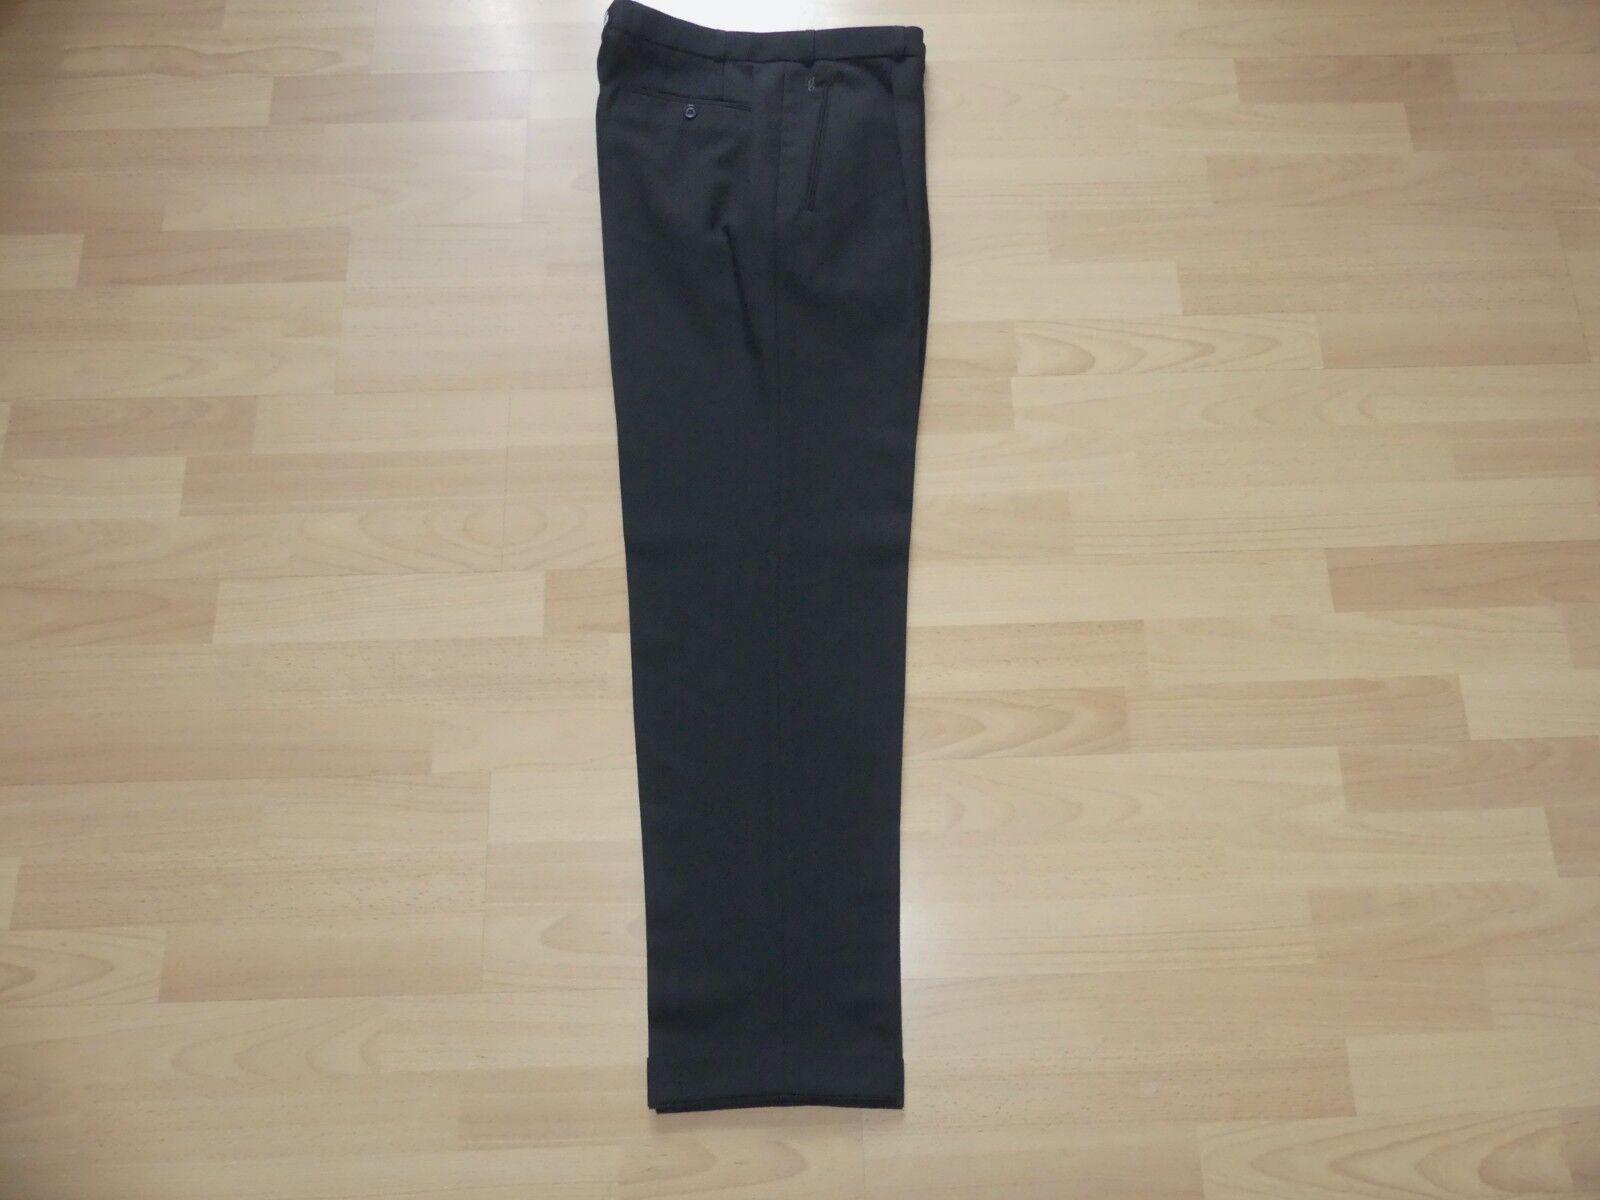 Gardeur High Twist Uomo Pantaloni Tuta Business Pantaloni Tessuto Tg 50 TOP Condizione